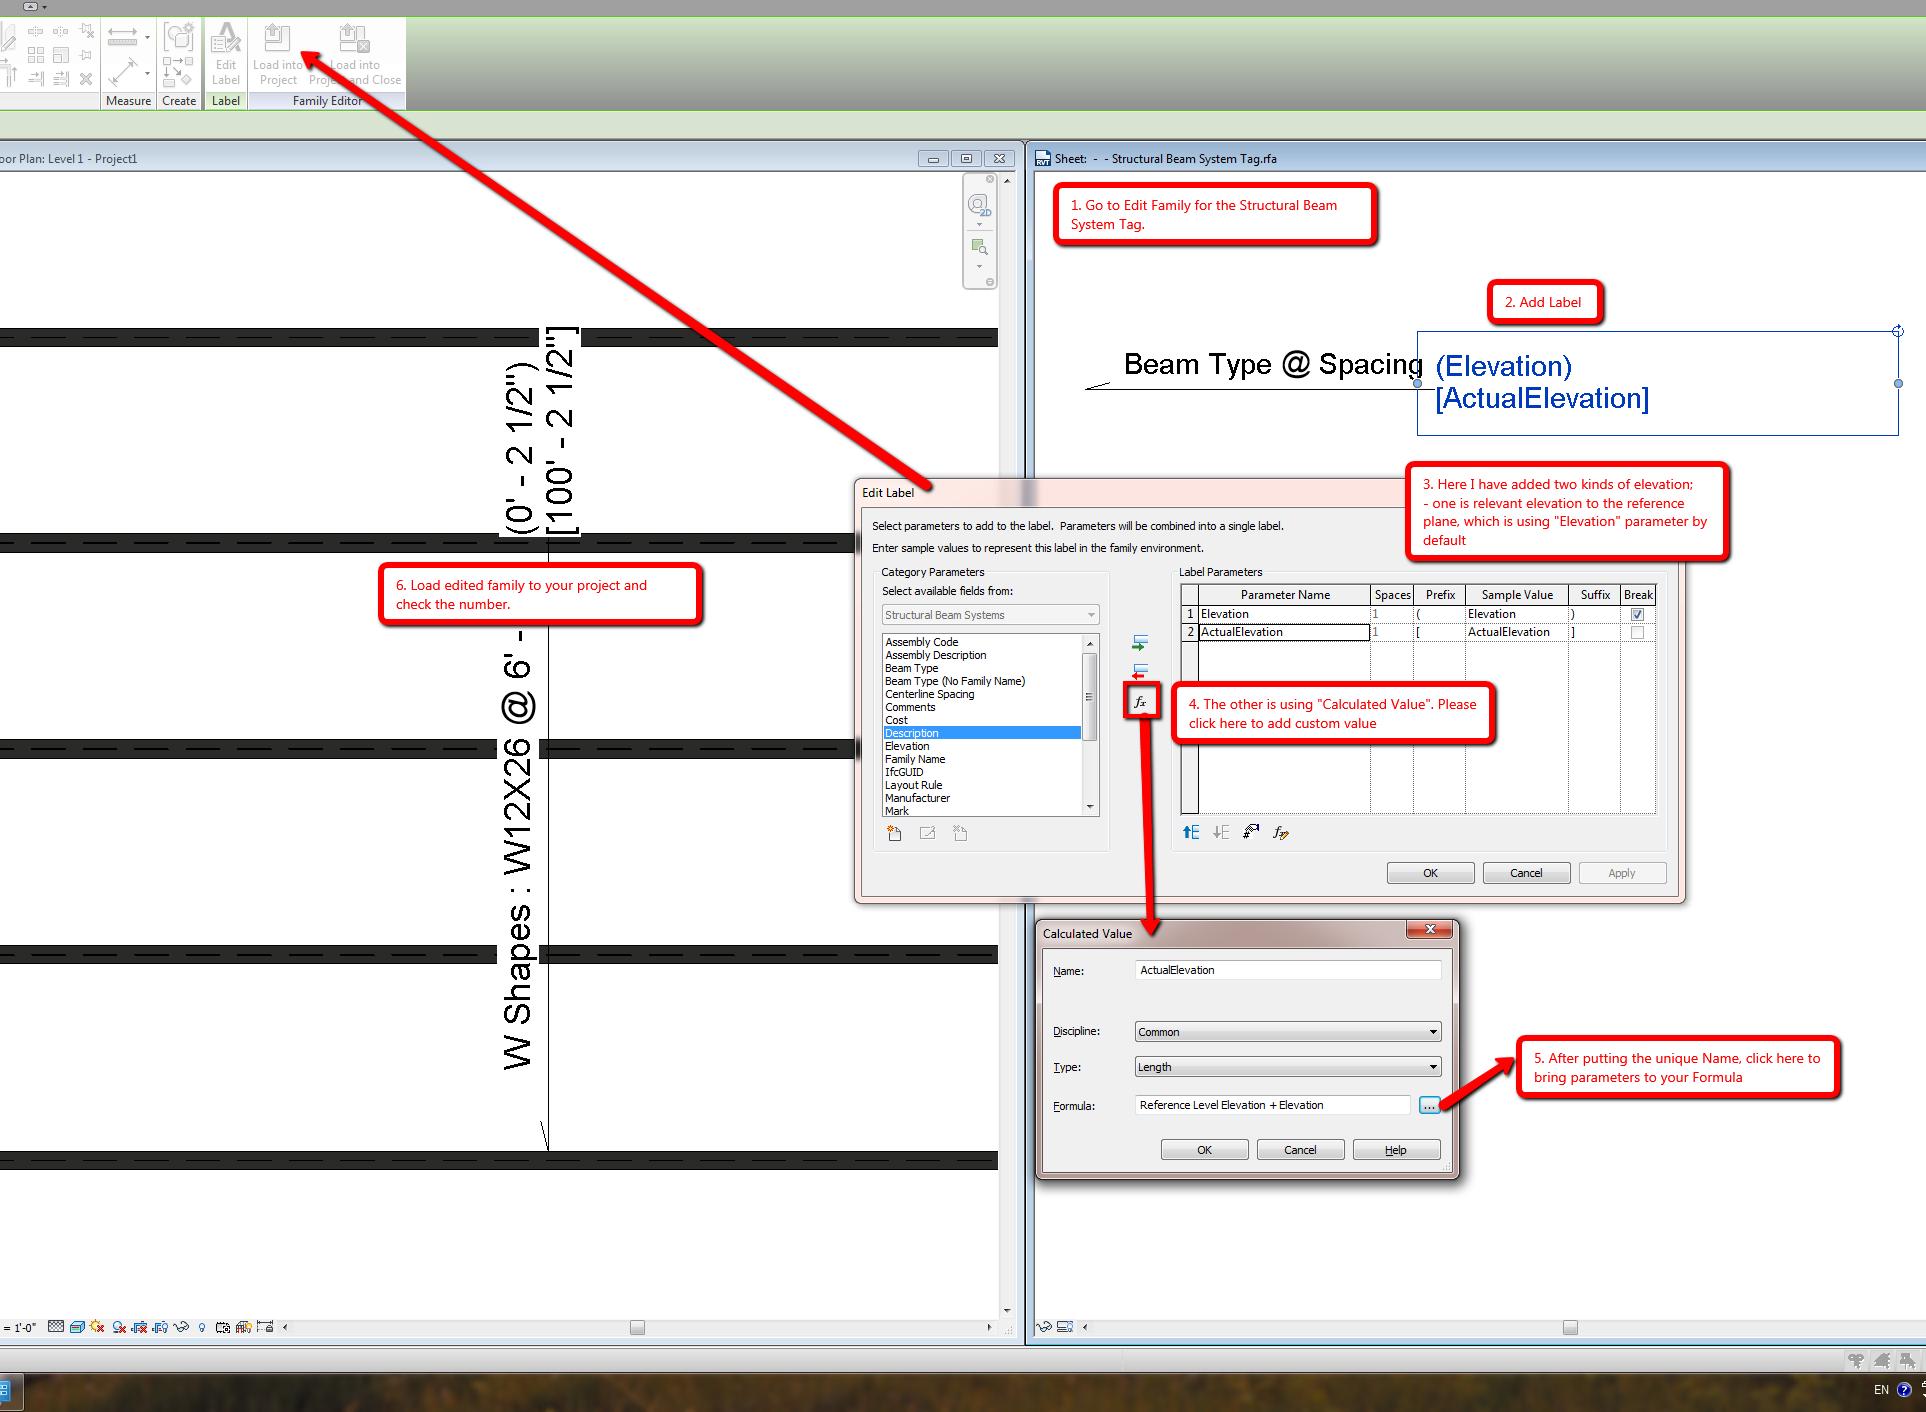 Beam System But Adding Elevation - Autodesk Community- Revit